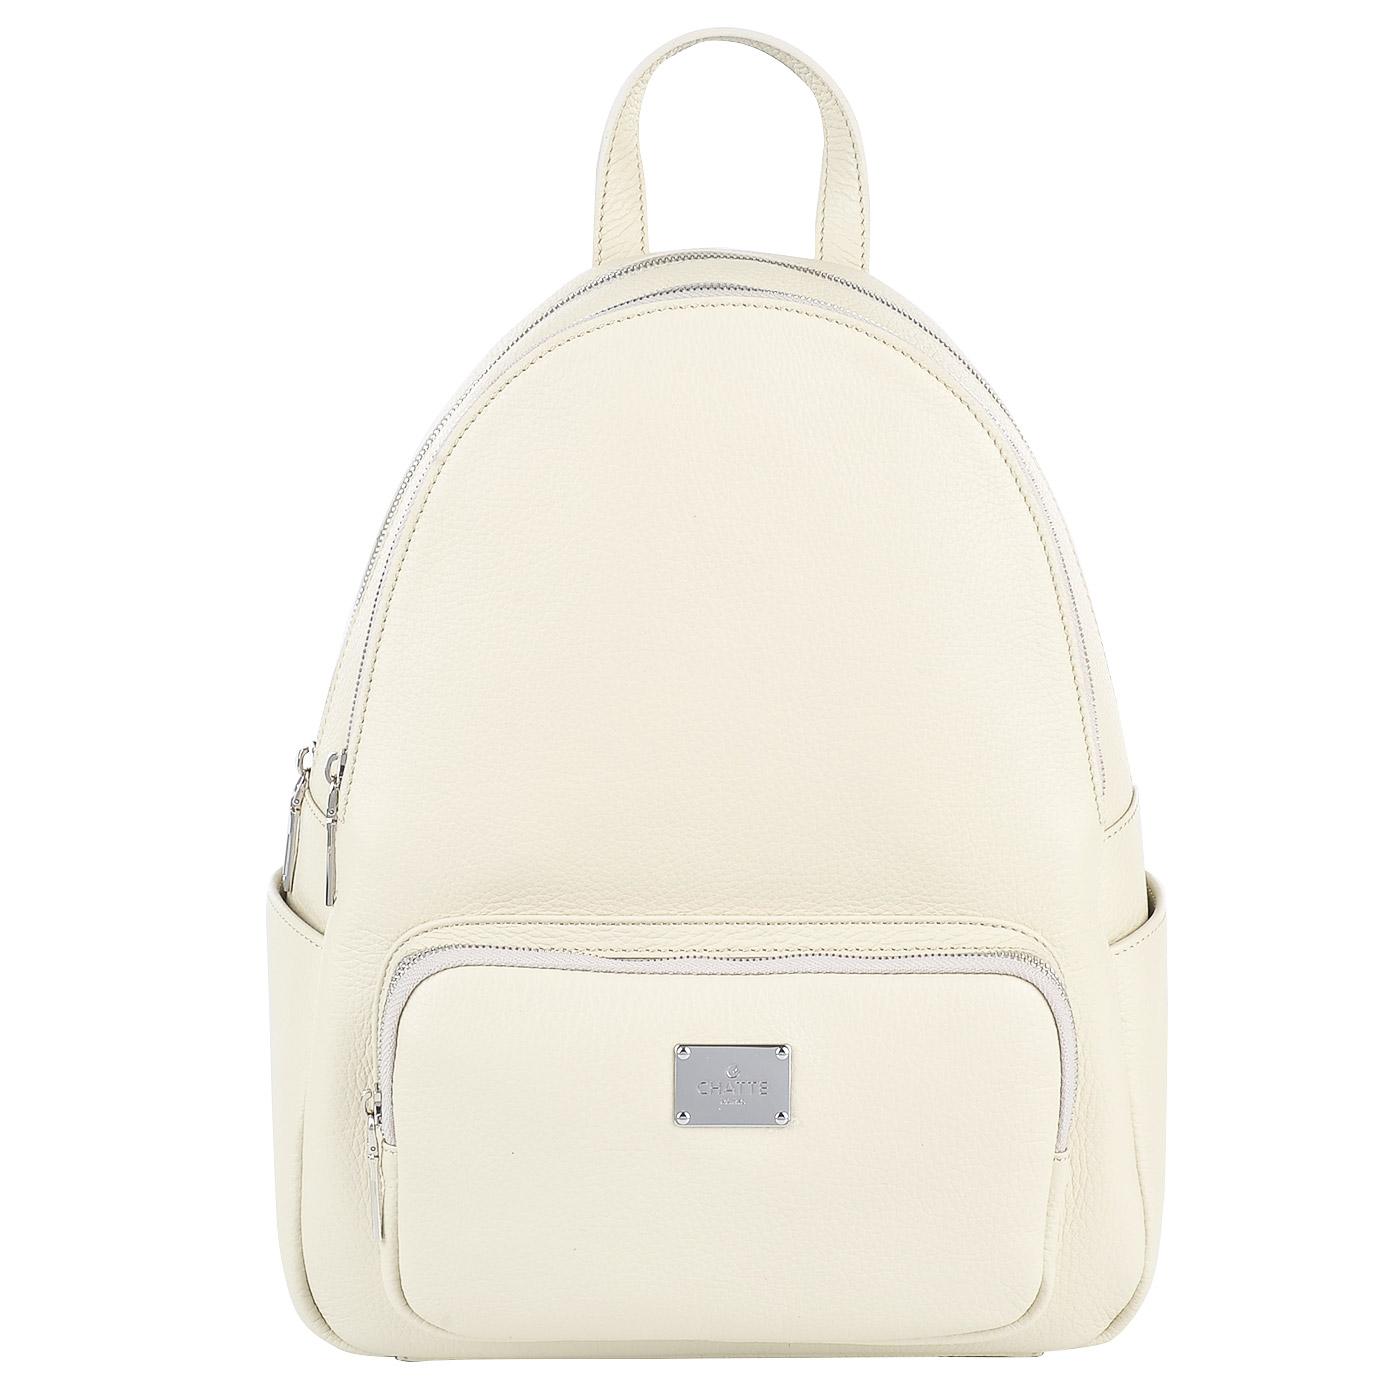 d3d709ad44ef Женский кожаный рюкзак Chatte DB9135_cream - 2000557720688 бежевый ...